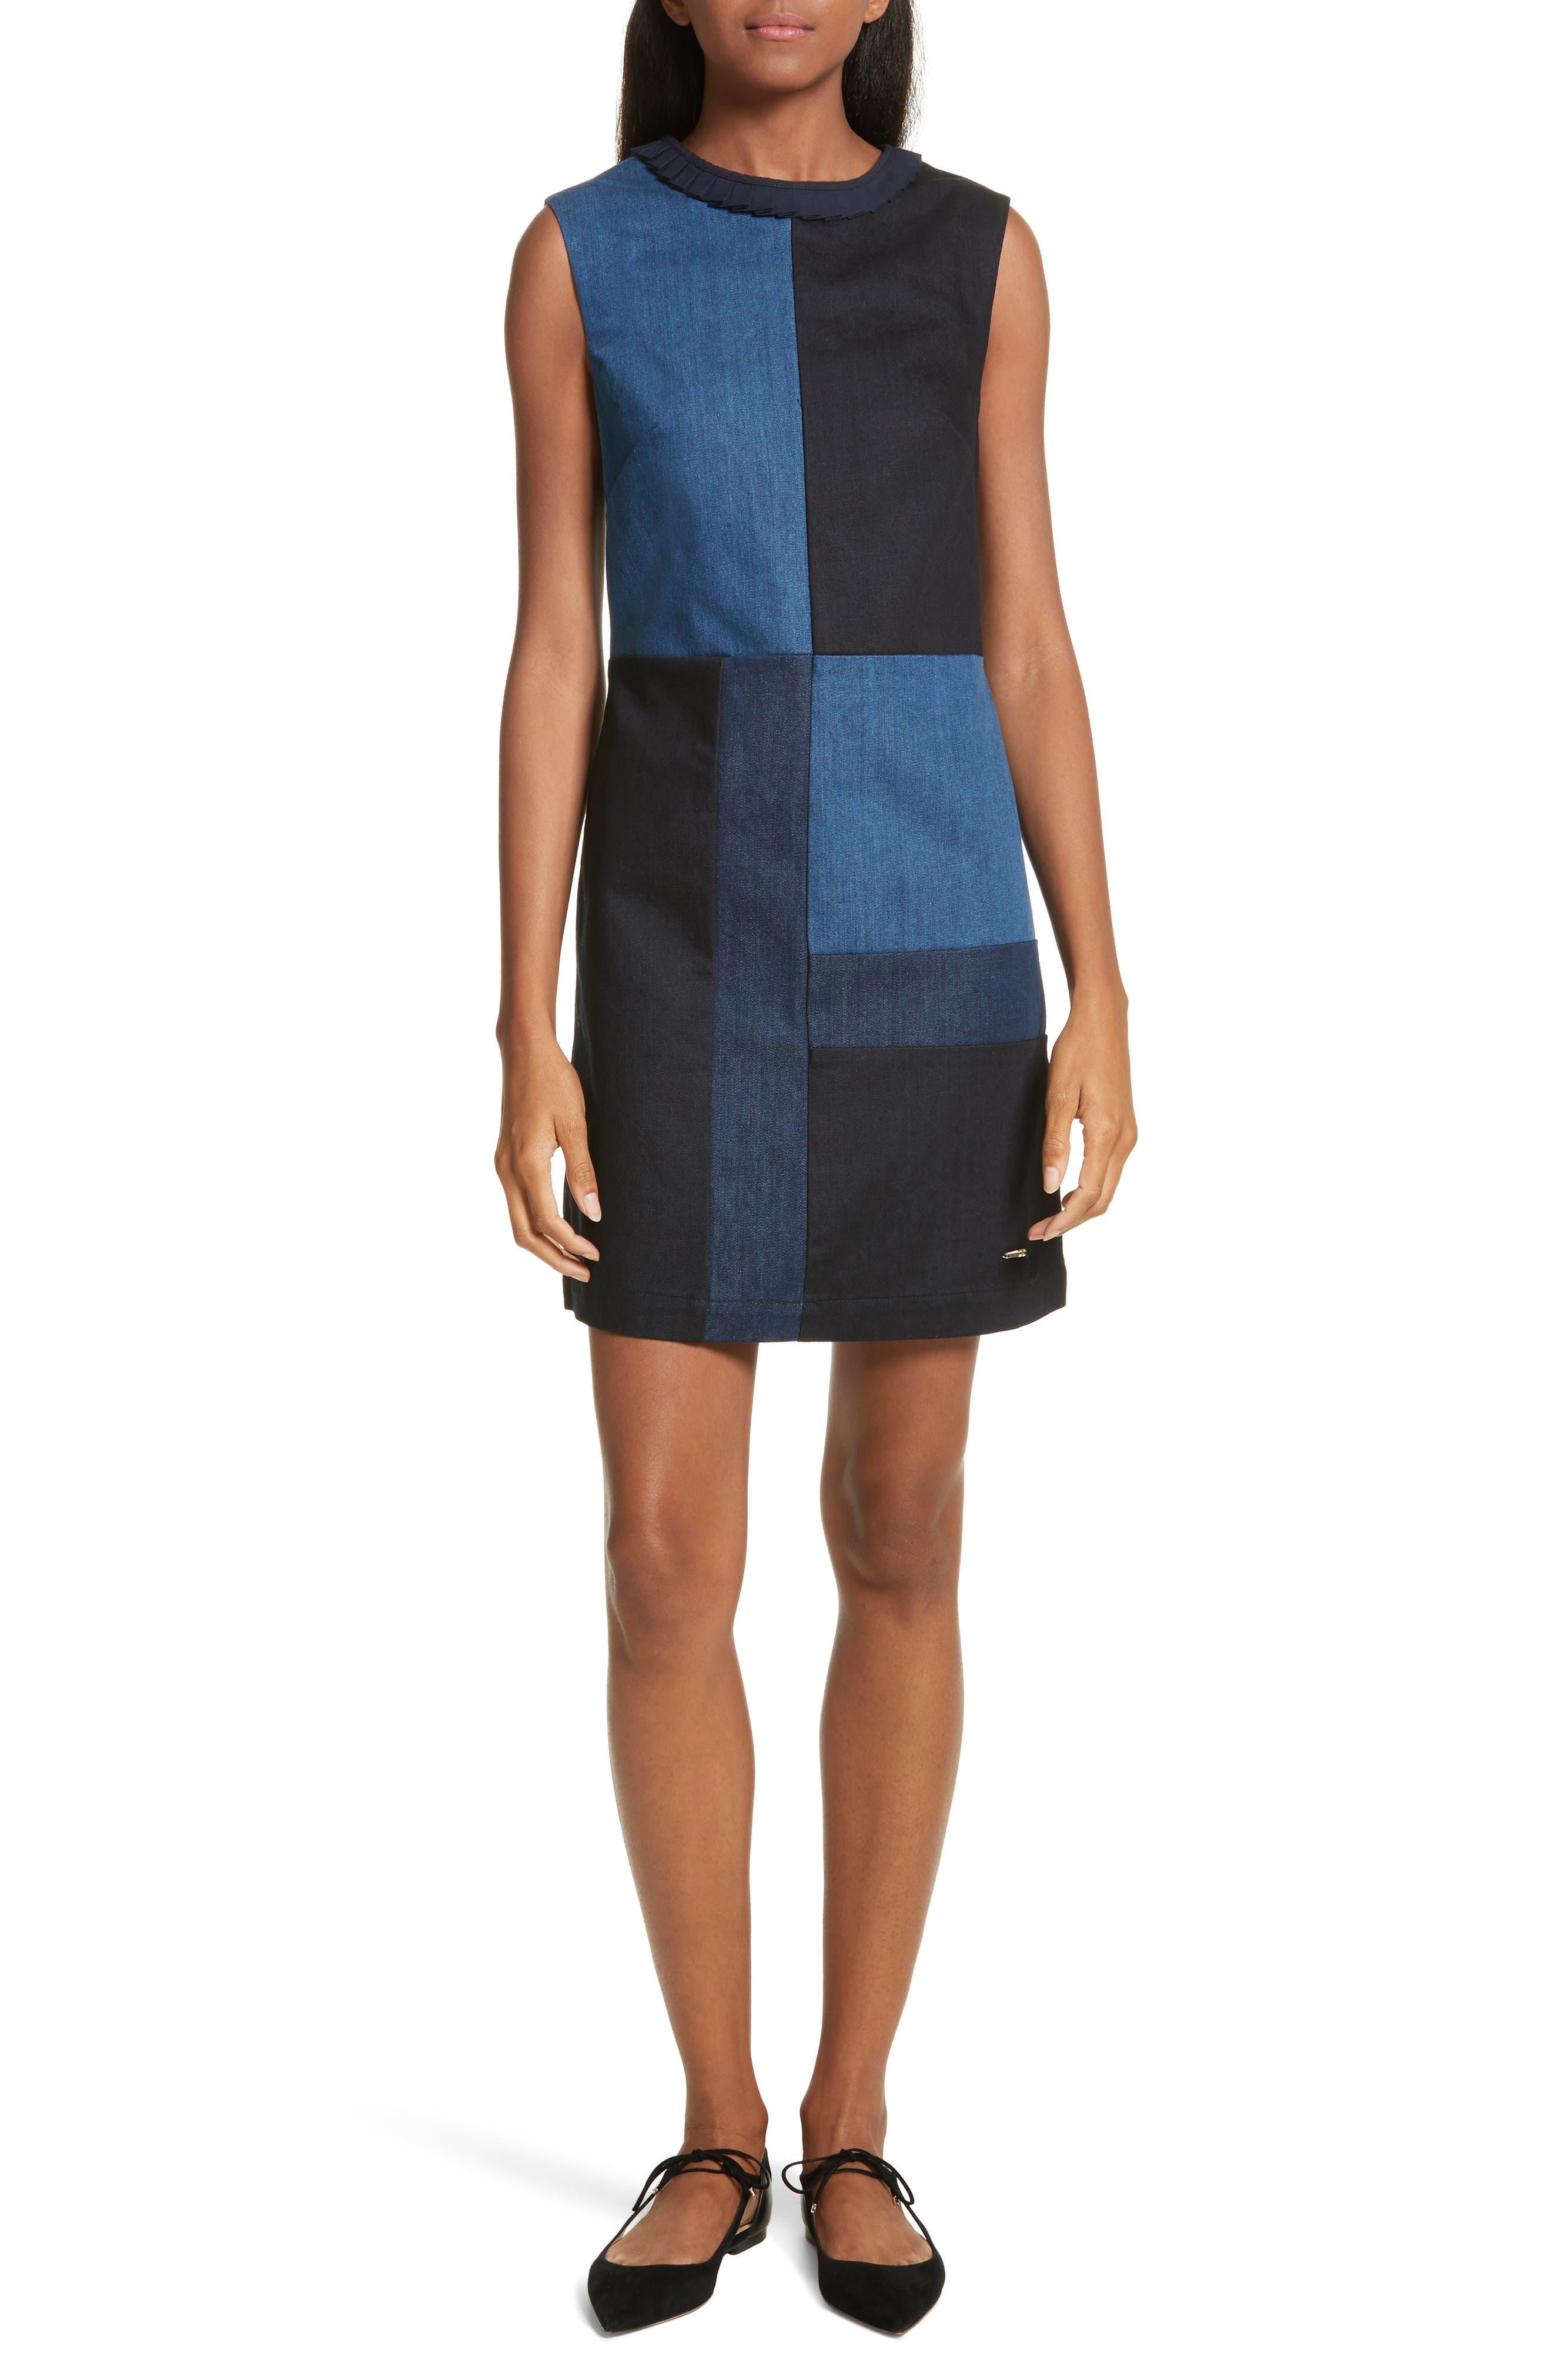 Ted Baker Morfee London Colorblock Denim A-Line Dress,                         Main,                         color, 431